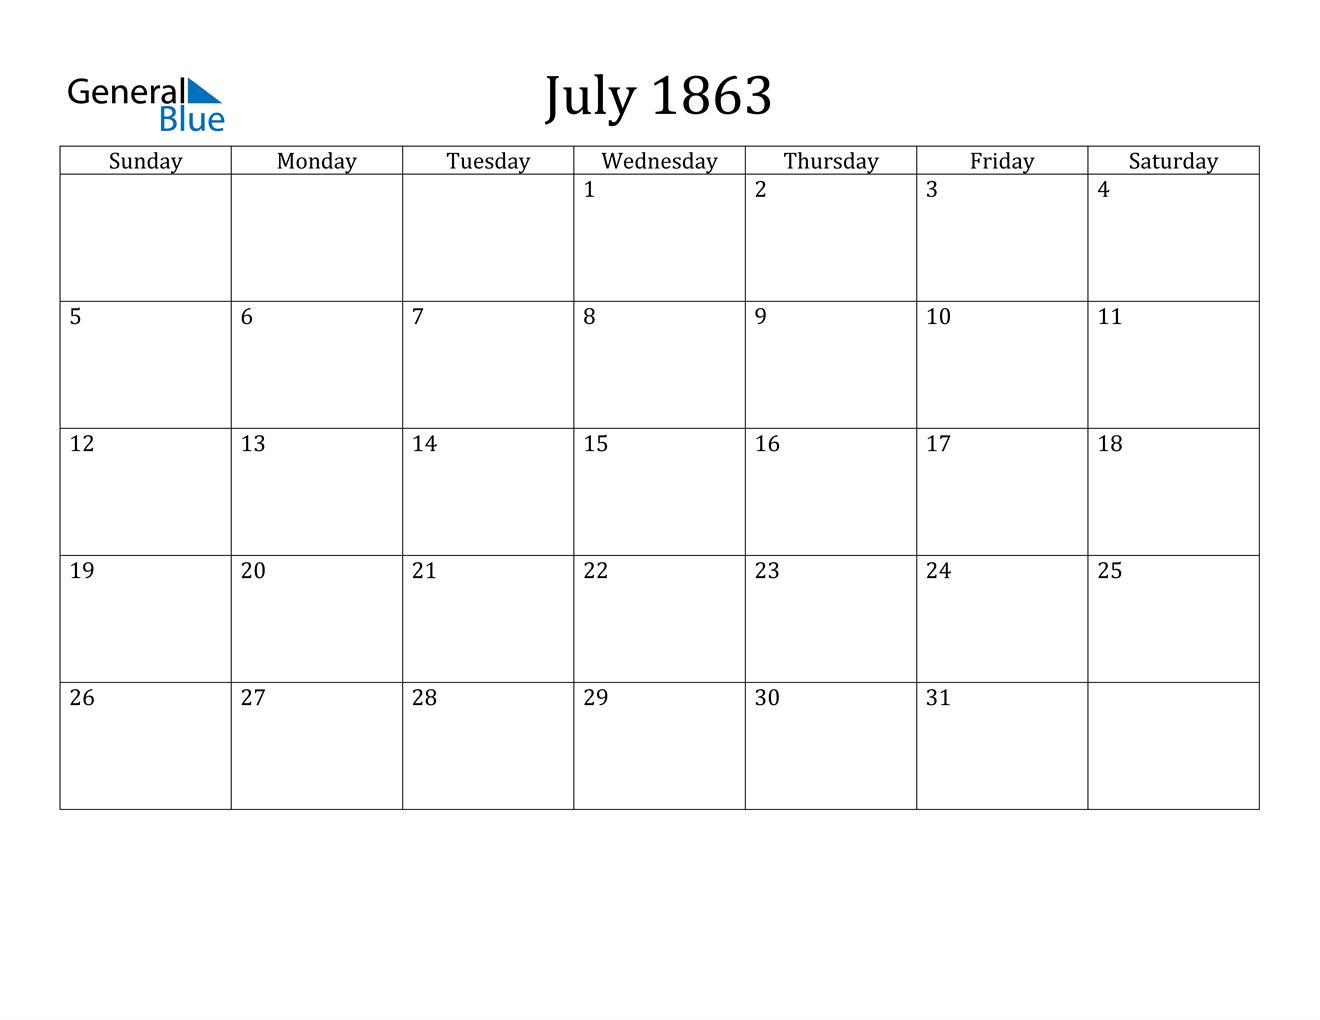 Image of July 1863 Calendar